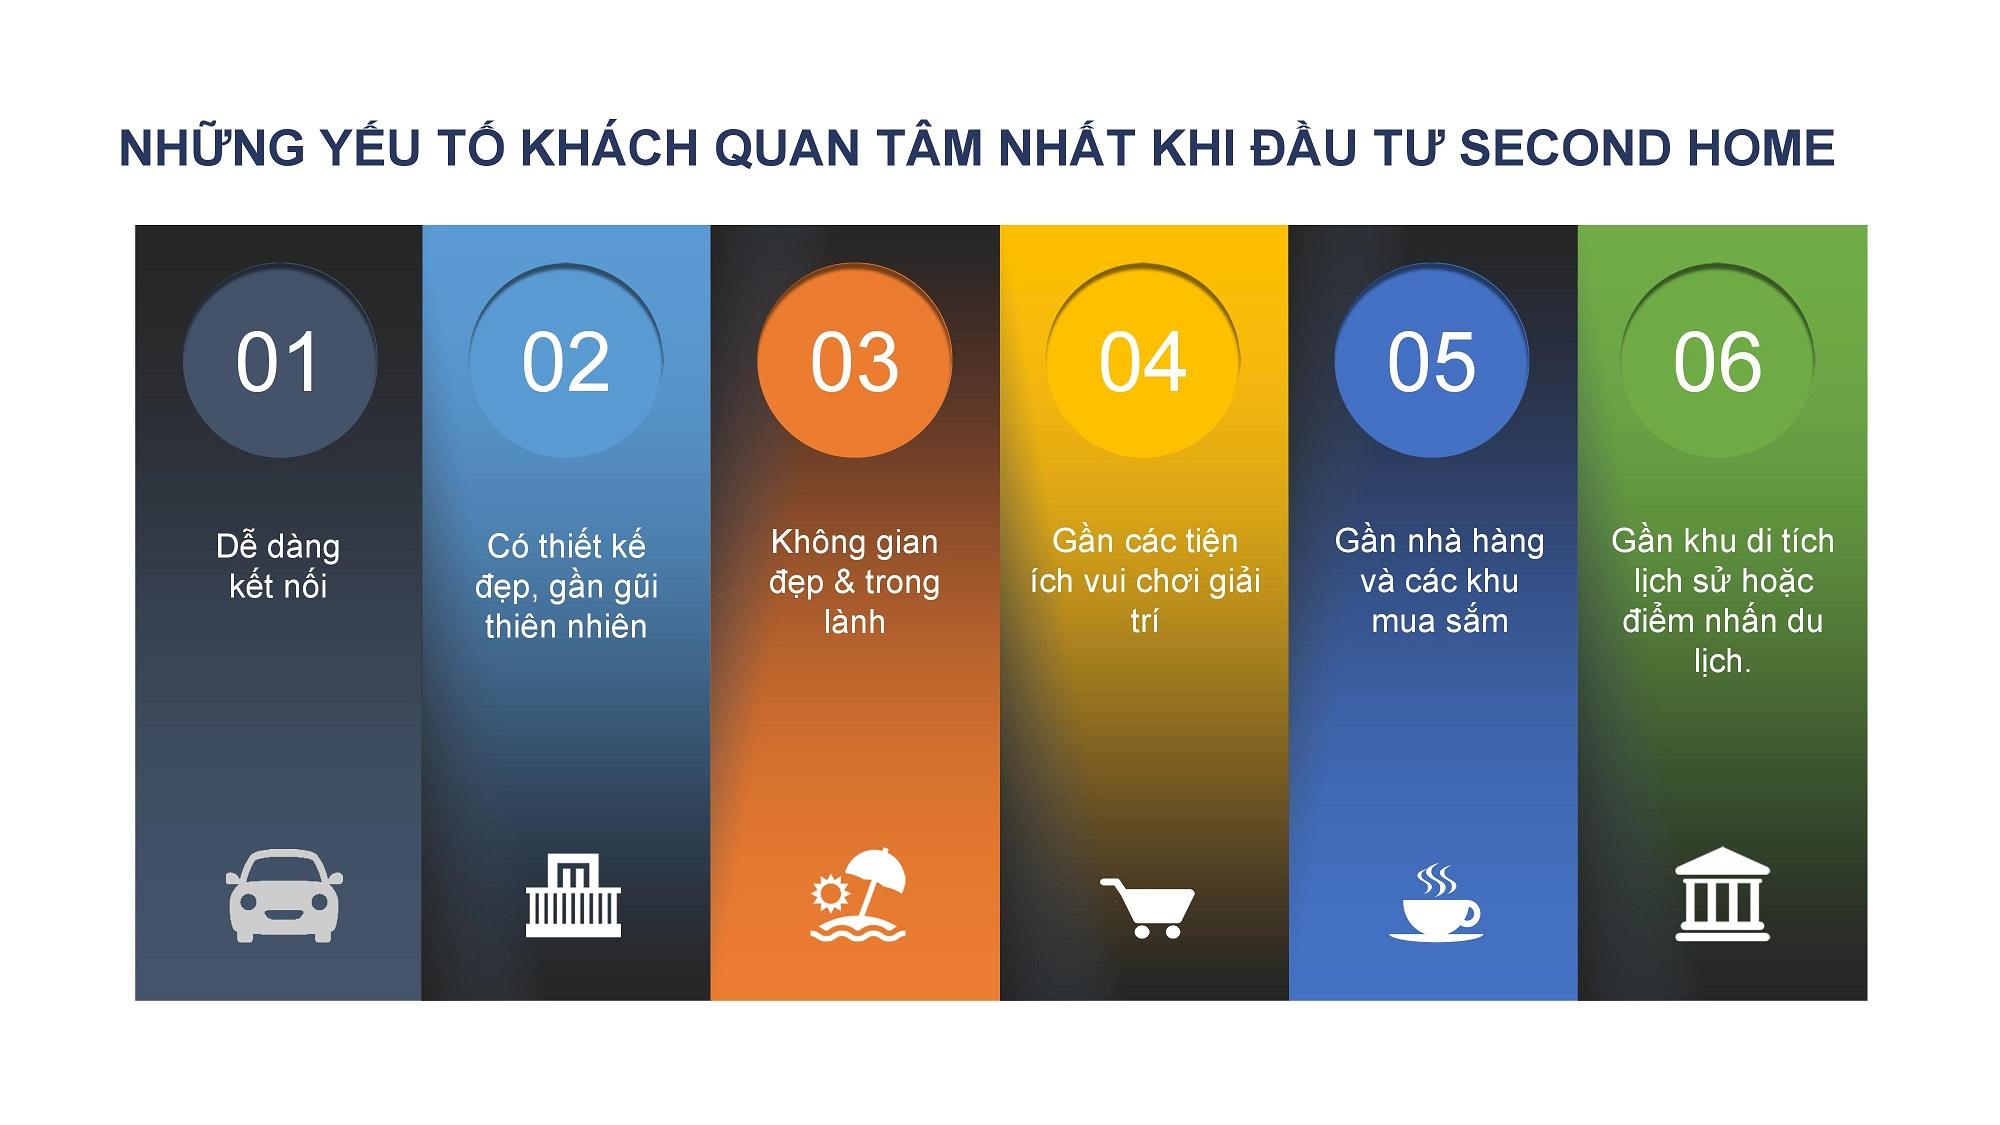 nhung-yeu-to-khach-quan-tam-second-home